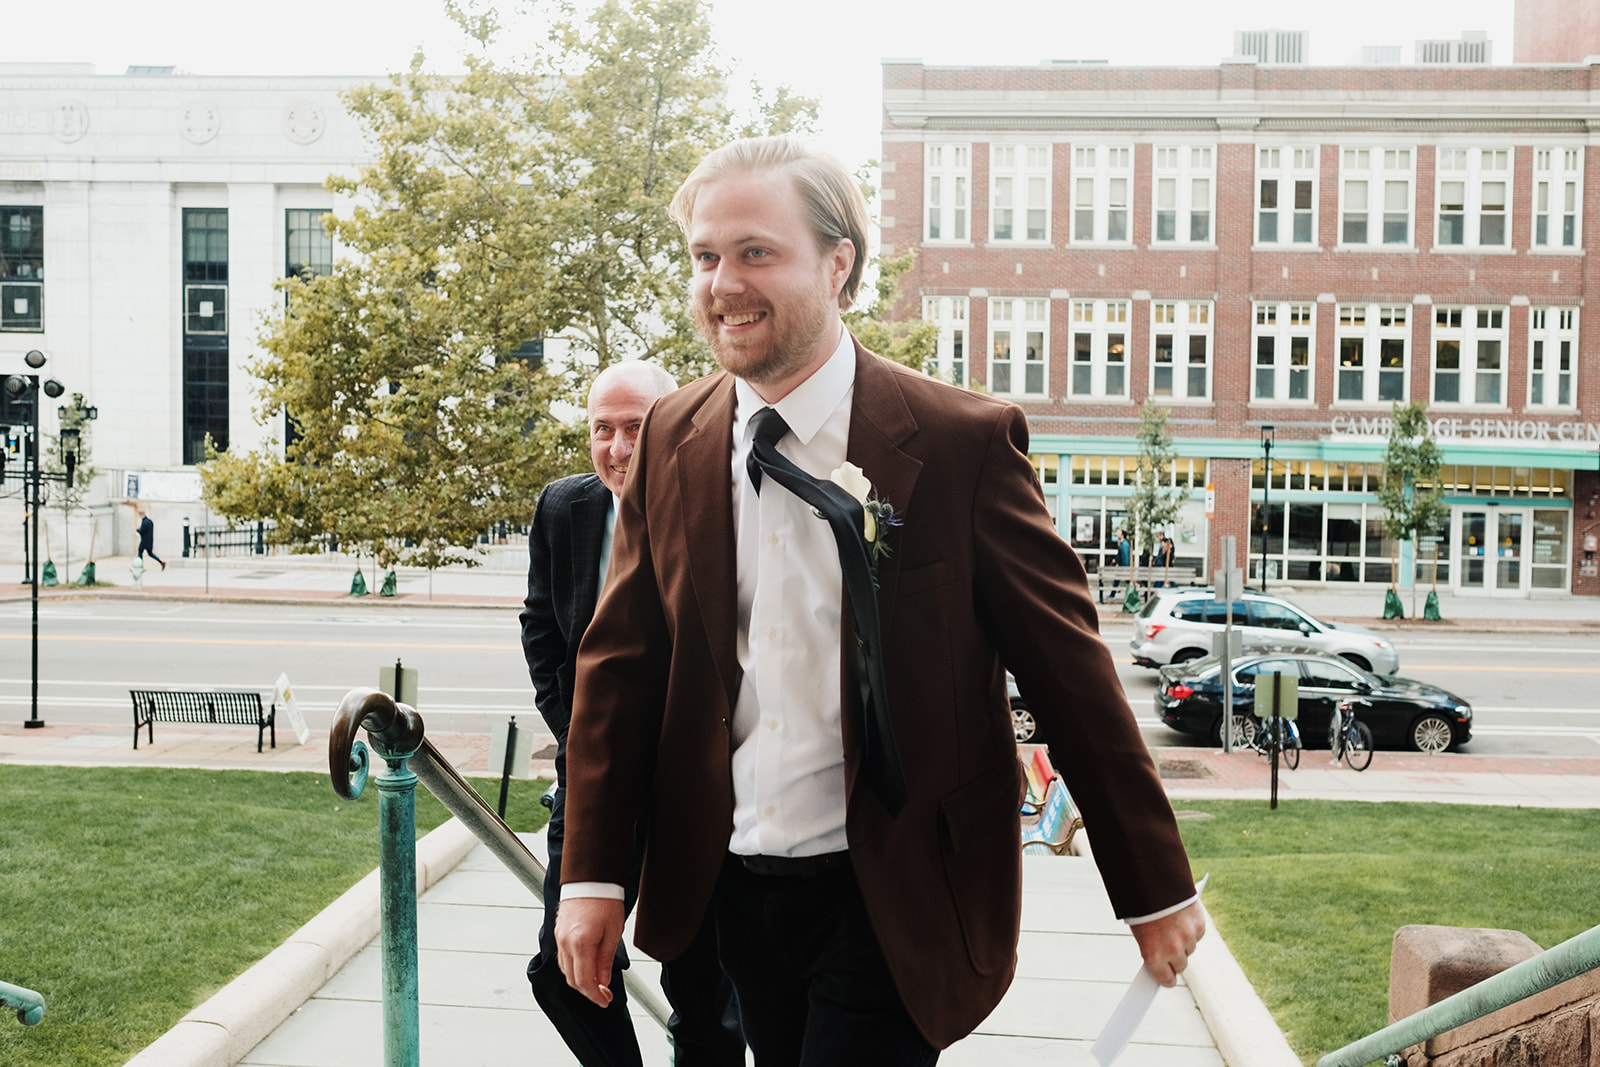 Wedding_Francis_Boucher_Elopement_Cambridge_MA_2018-31.jpg